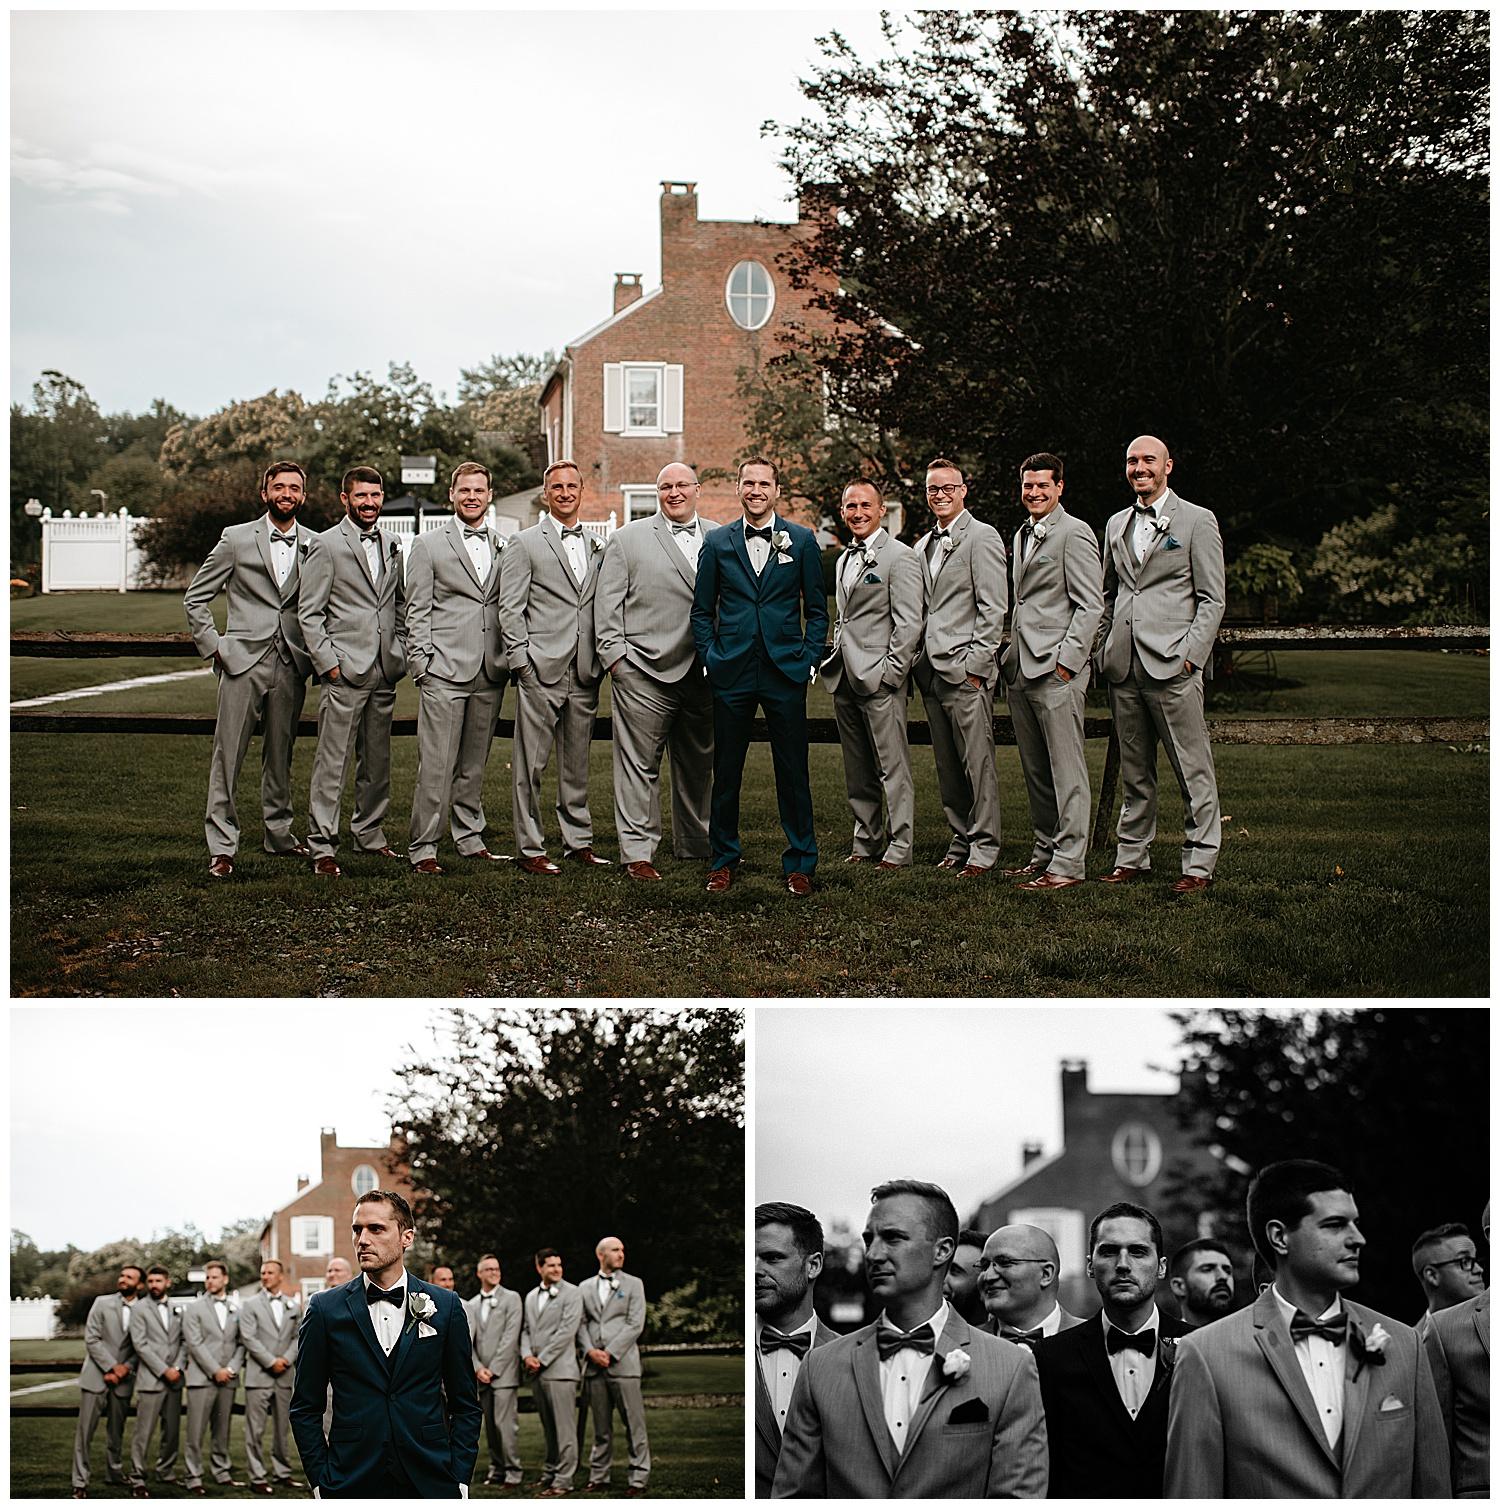 NEPA-Bloomsburg-Wedding-Photographer-at-The-Barn-at-Boones-Dam-Bloomsburg-PA_0029.jpg